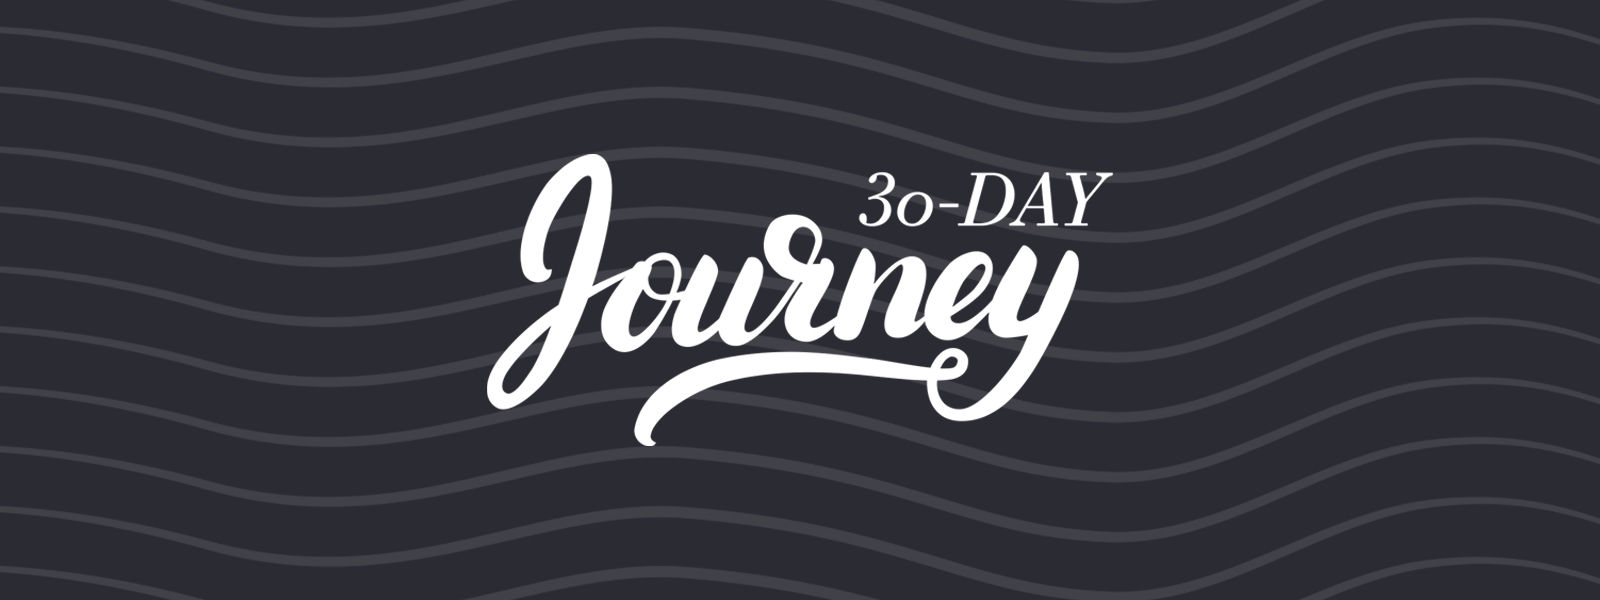 30-Day Journey